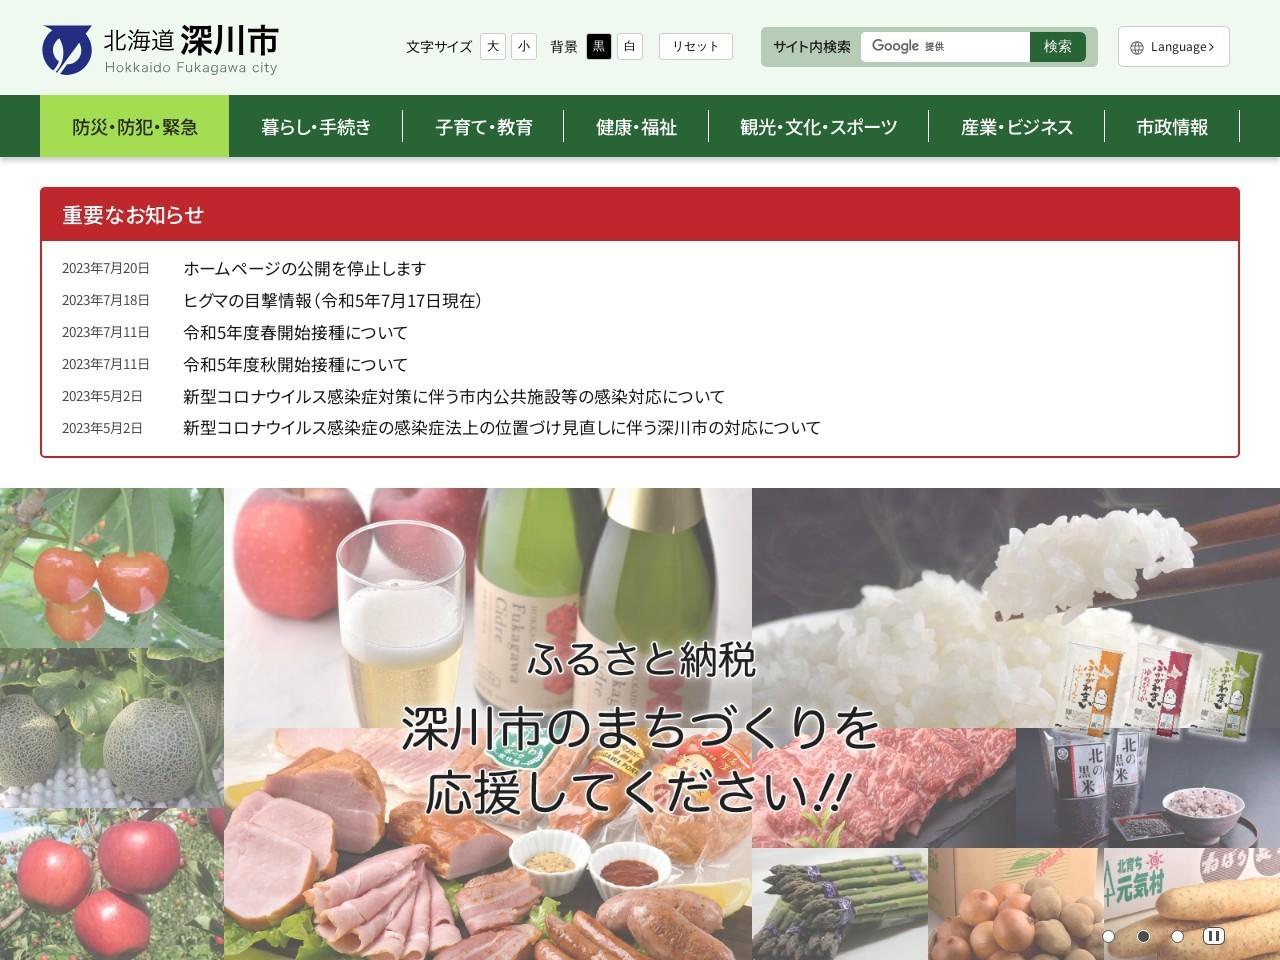 https://www.city.fukagawa.lg.jp/cms/section/kankyo/uo2pli0000006xea.html